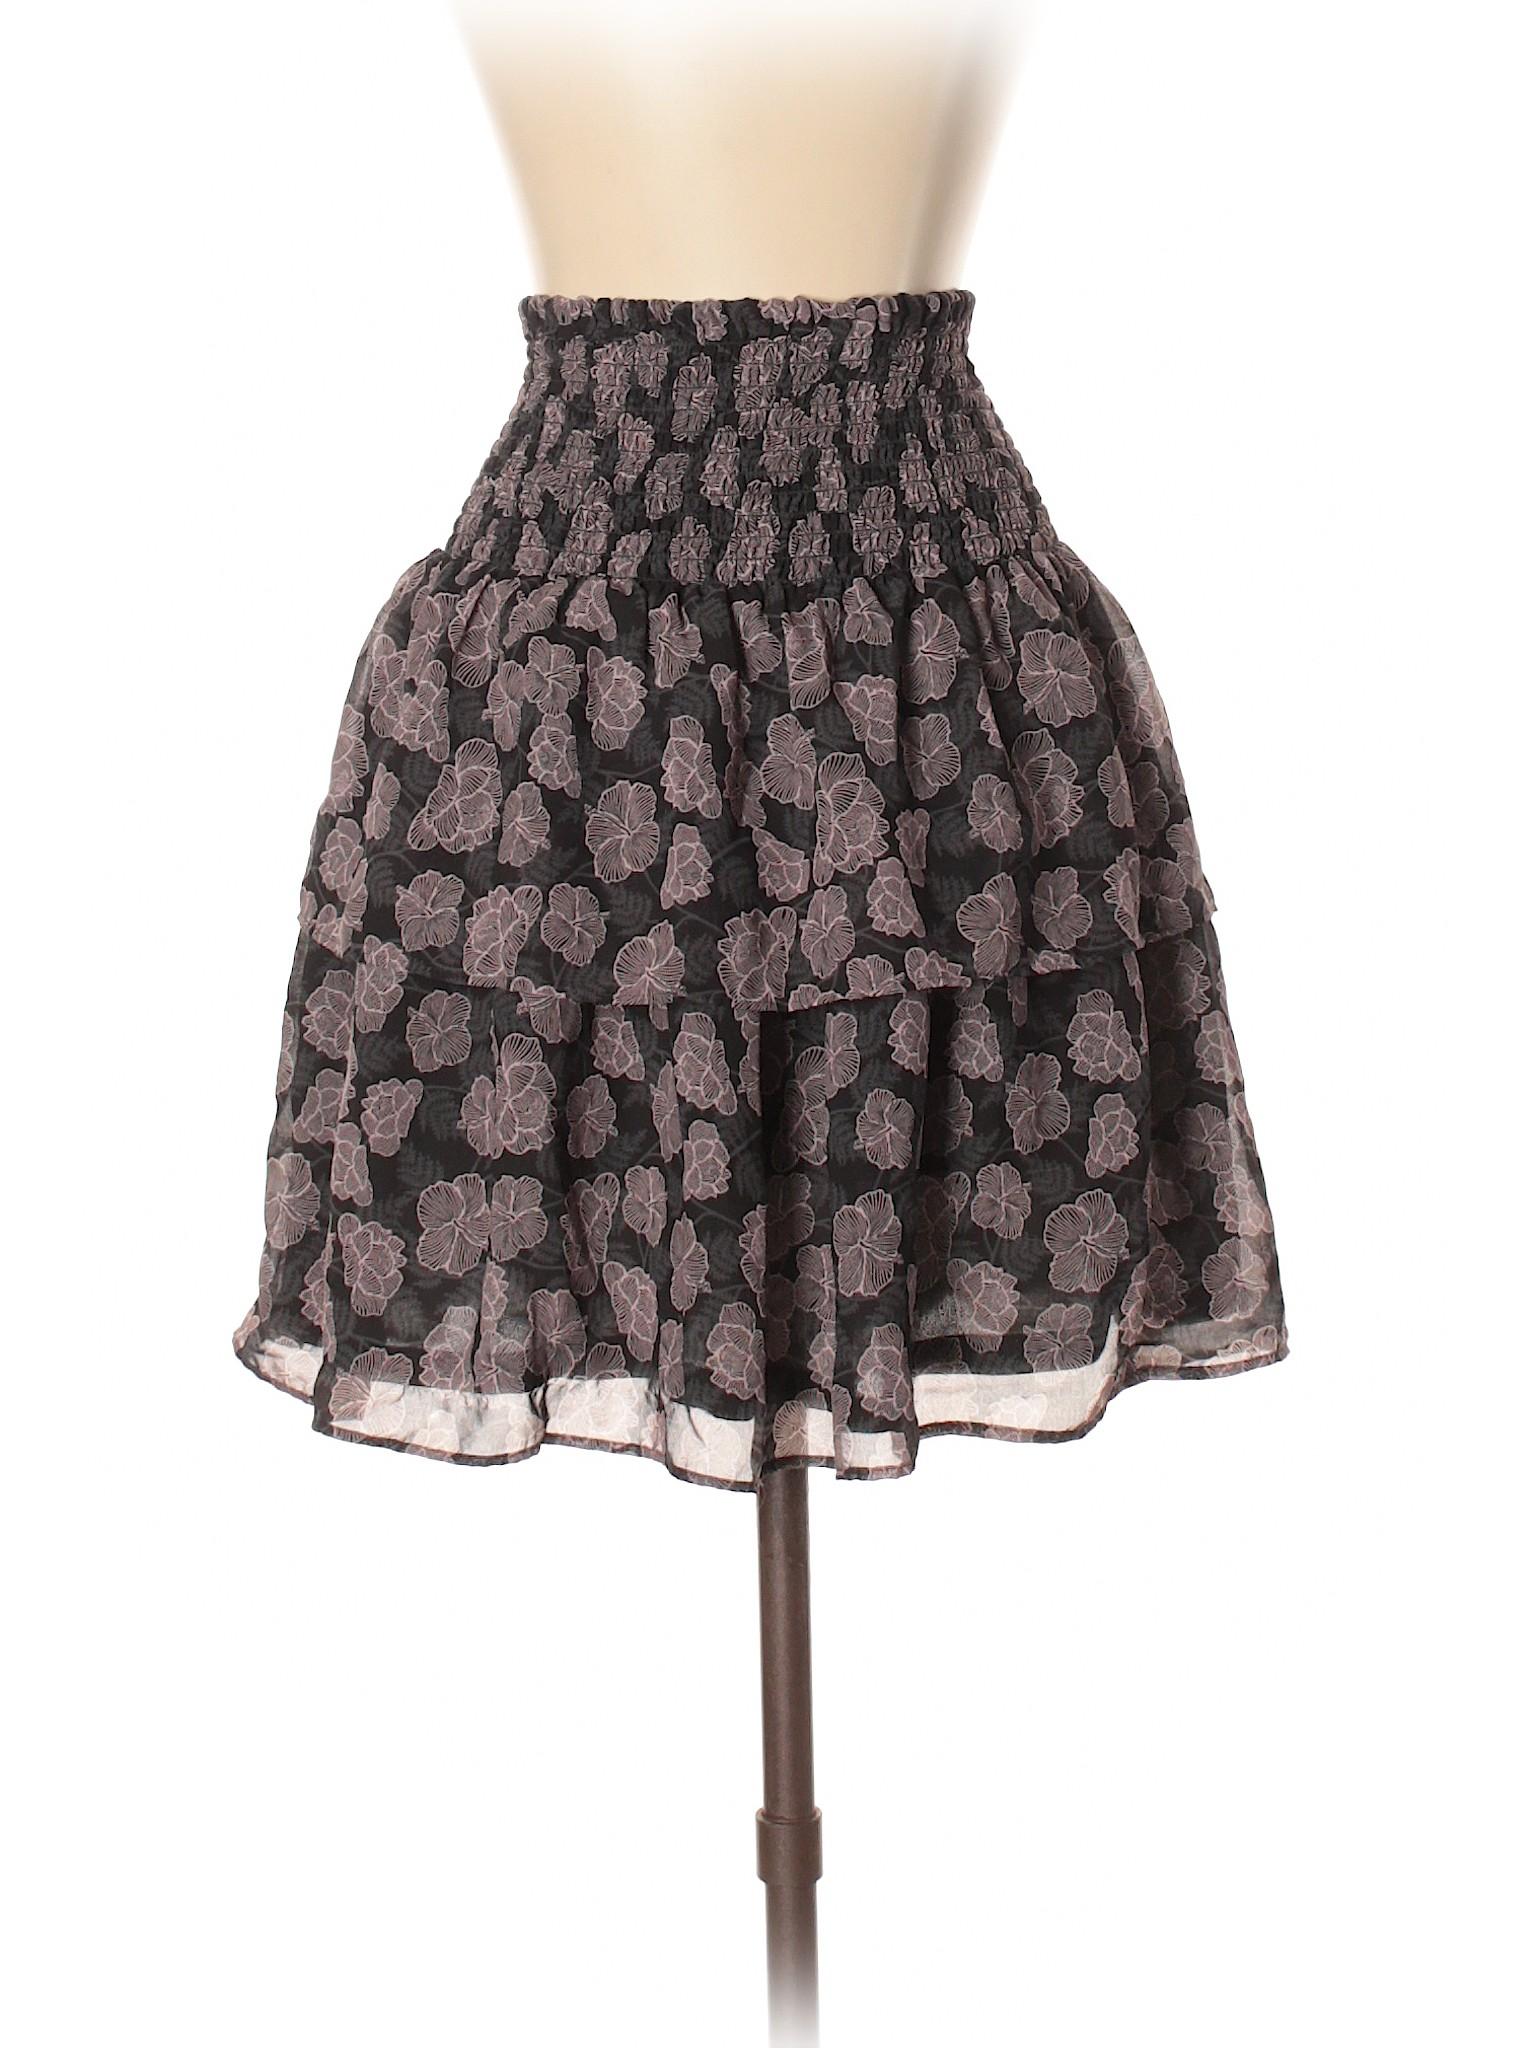 Casual Boutique Boutique Casual Skirt Skirt ZqxwxF46t